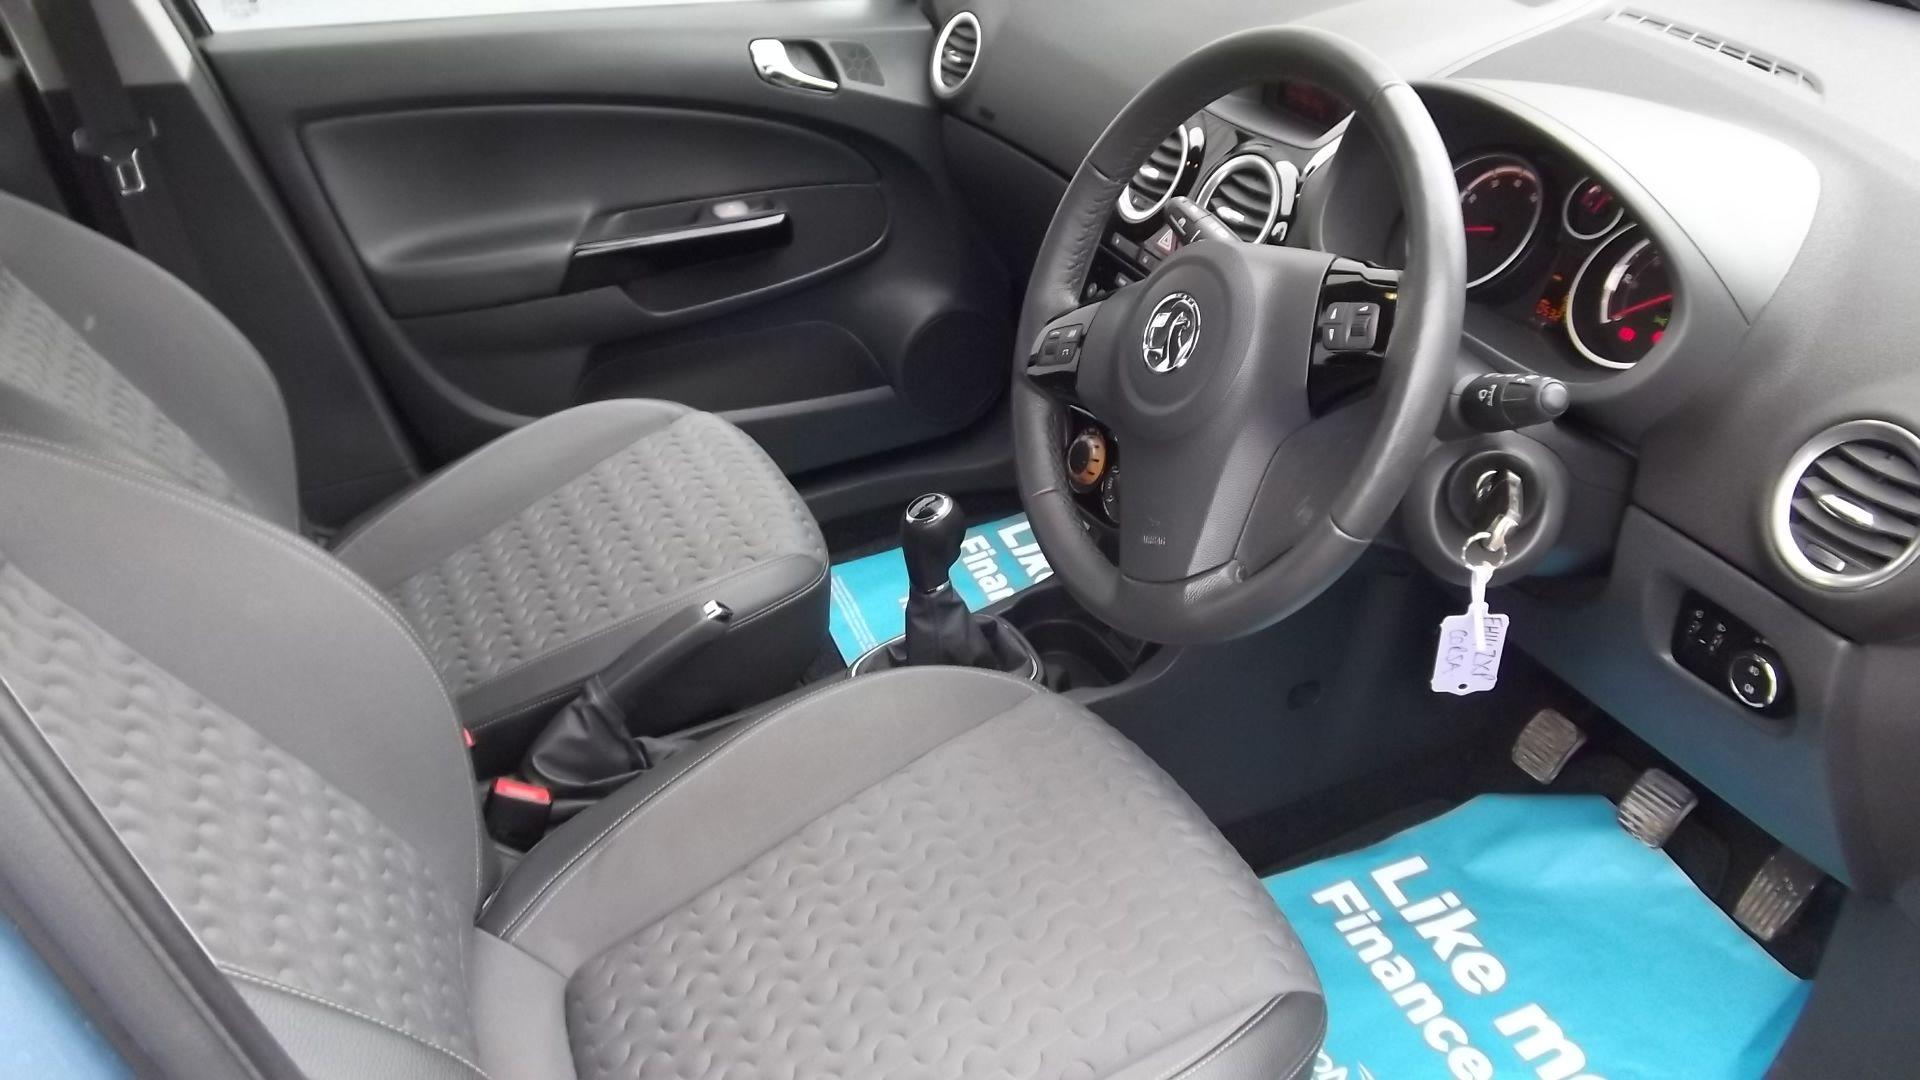 2014 Vauxhall Corsa Se 5Dr Hatchback - Full Service History - CL505 - NO VAT ON THE HAMMER - - Image 8 of 24